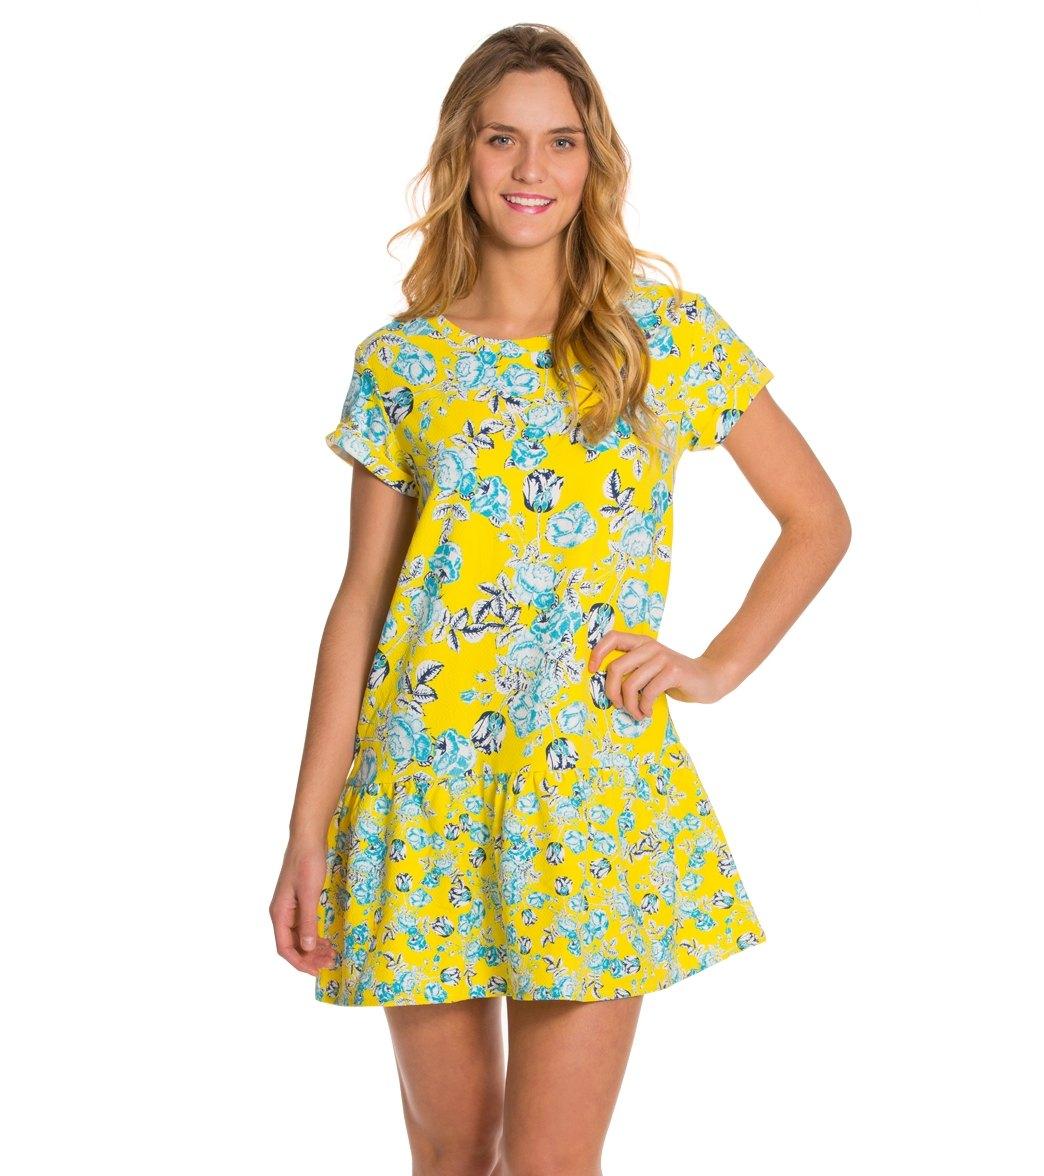 ca1753fb6ed2 MINKPINK Citrus Floral Dress at SwimOutlet.com - Free Shipping